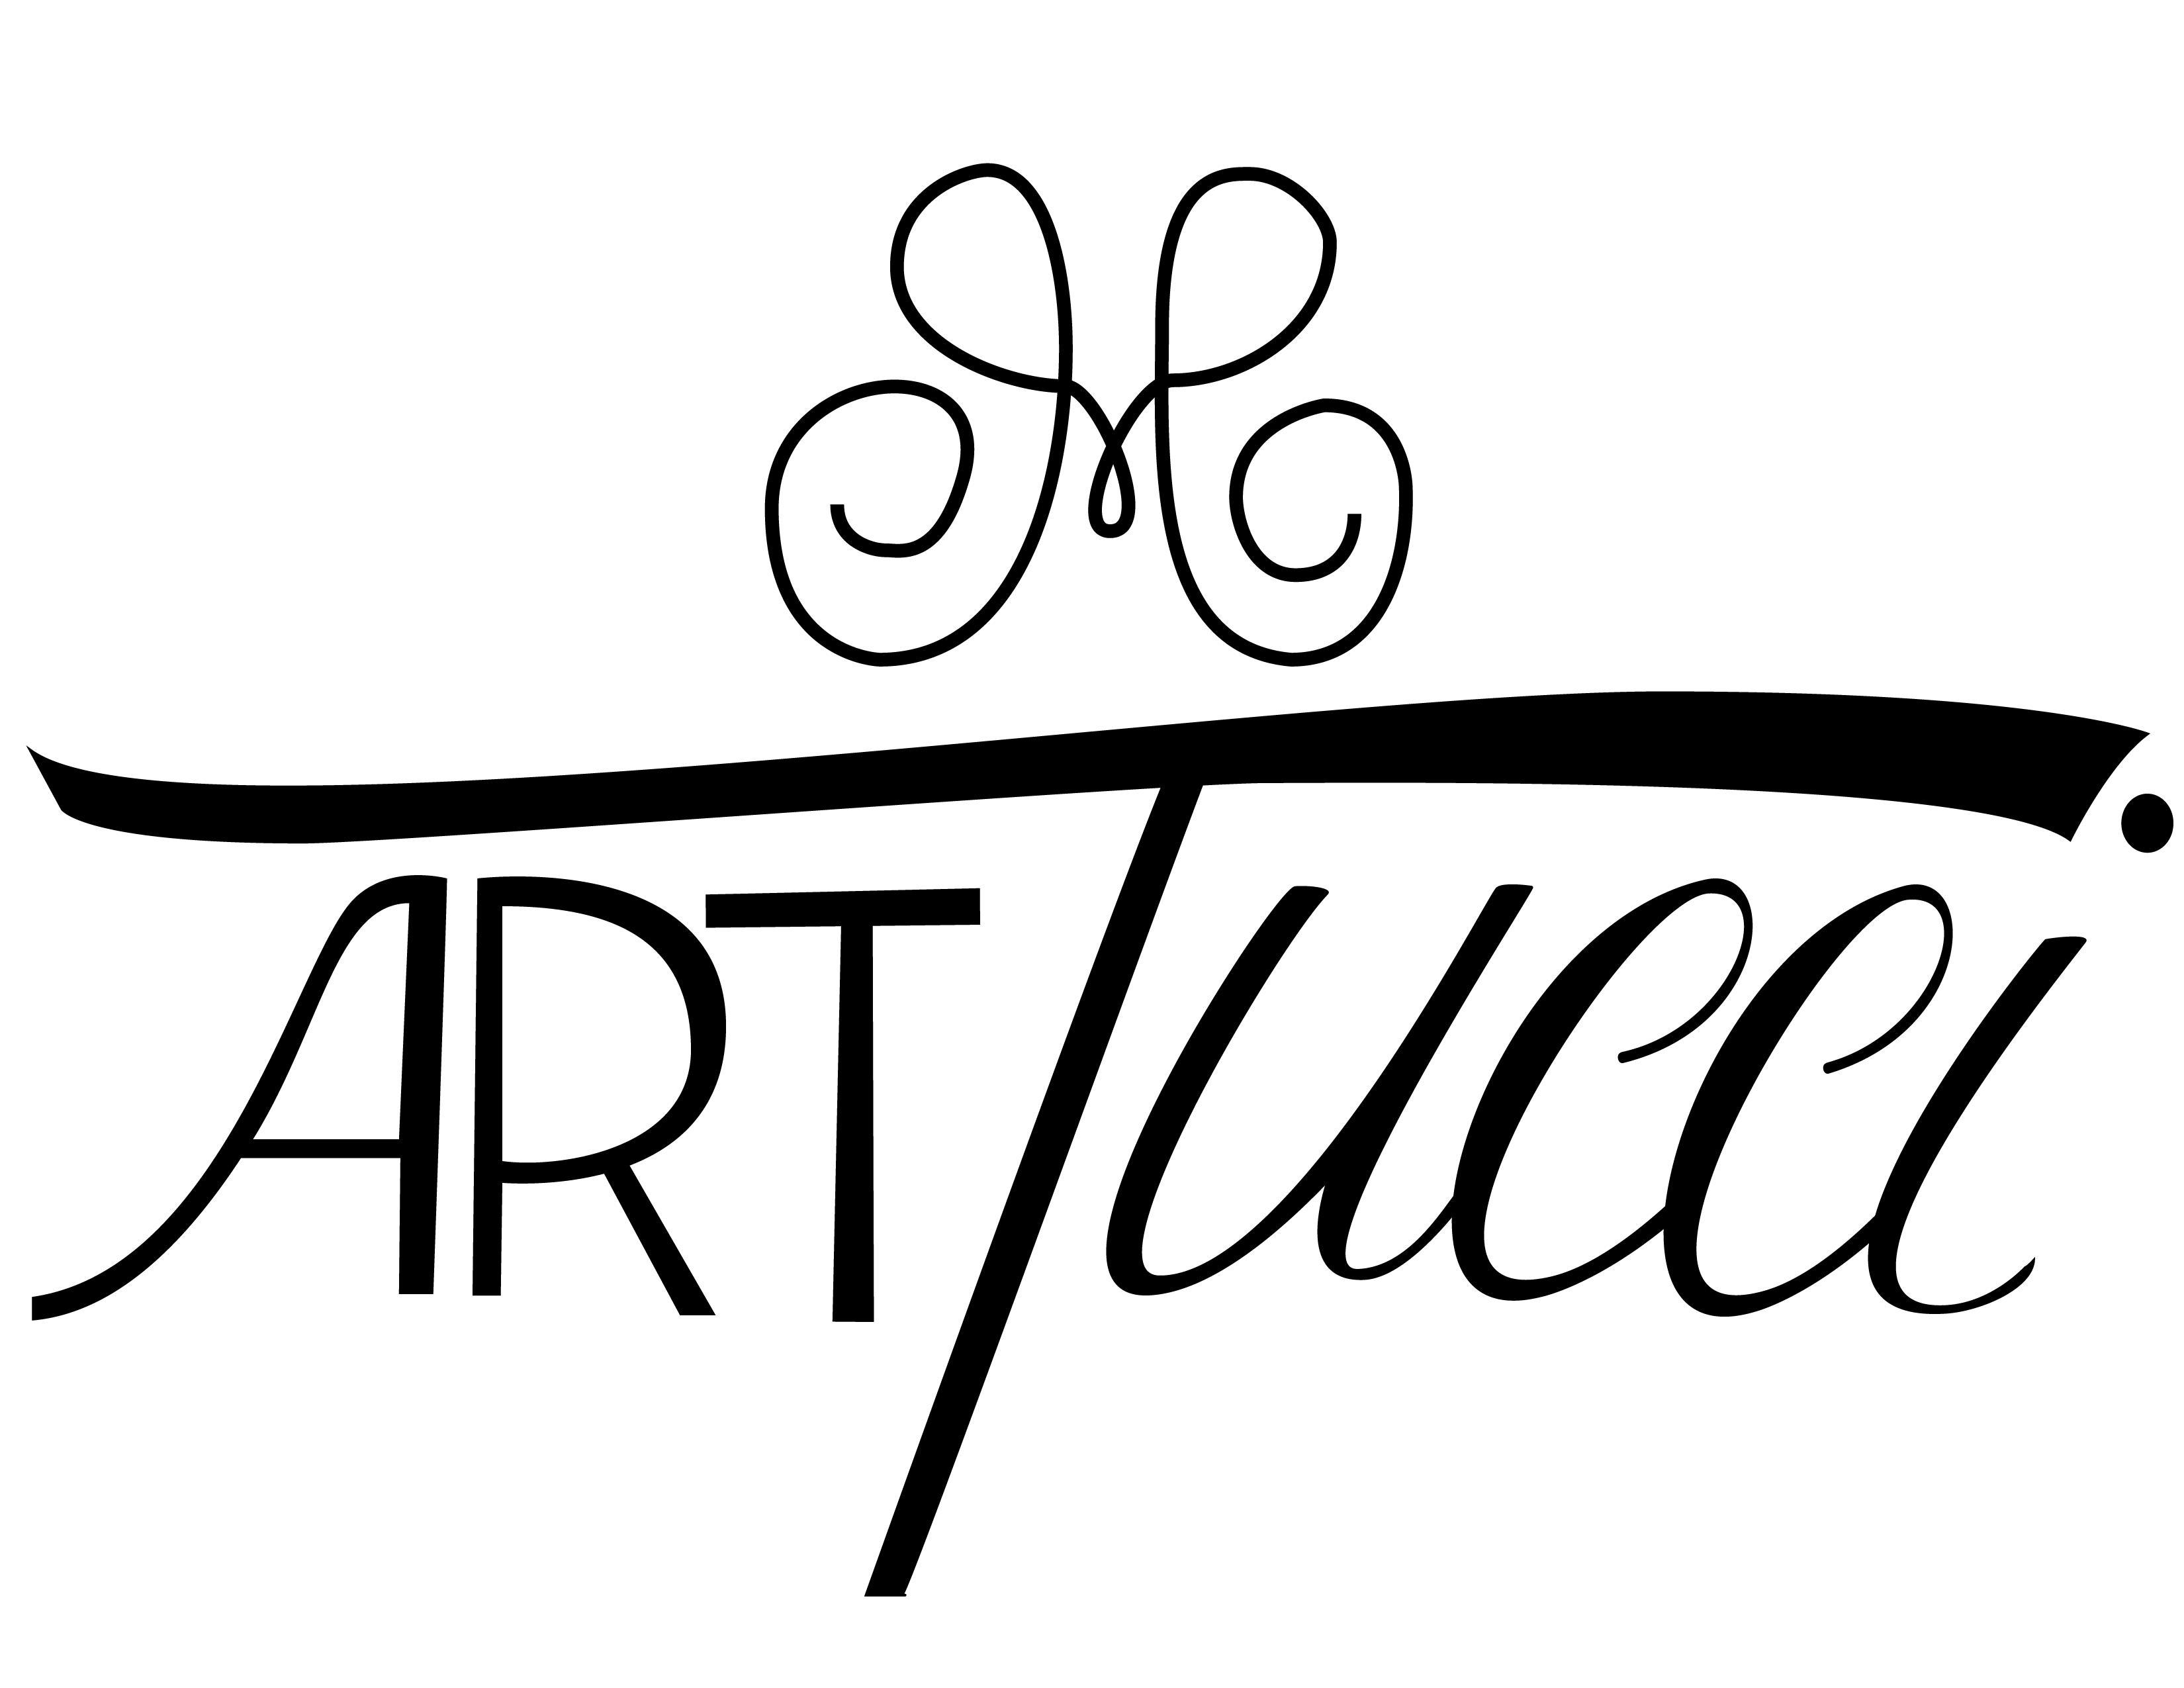 Art Tucci